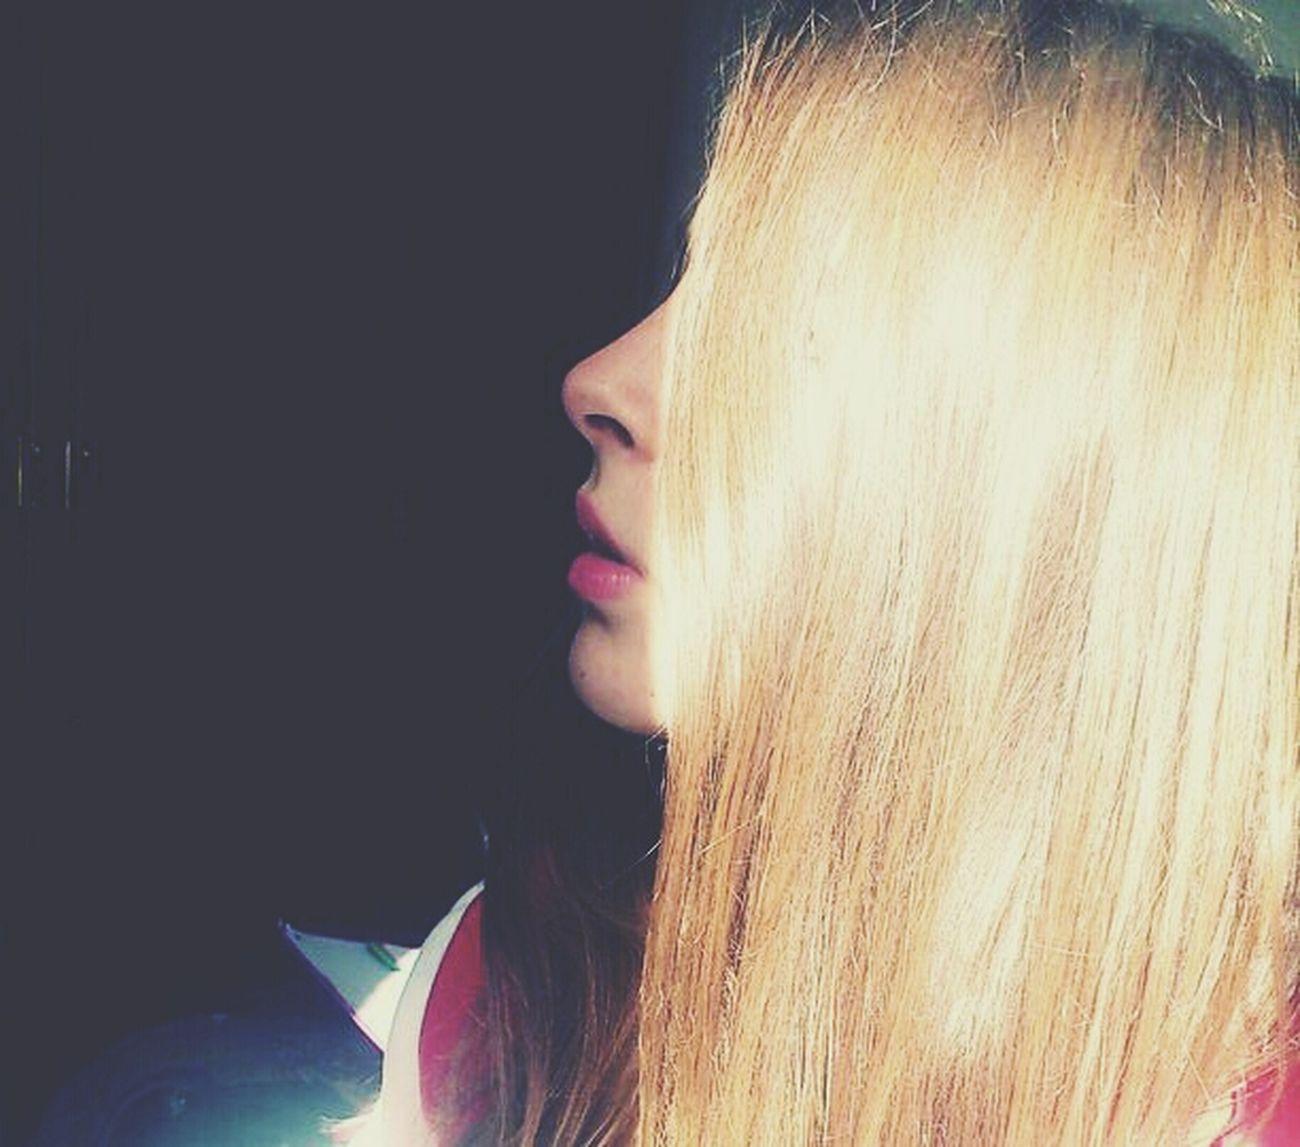 Longhair Sunlight Lips Tumblrgirl